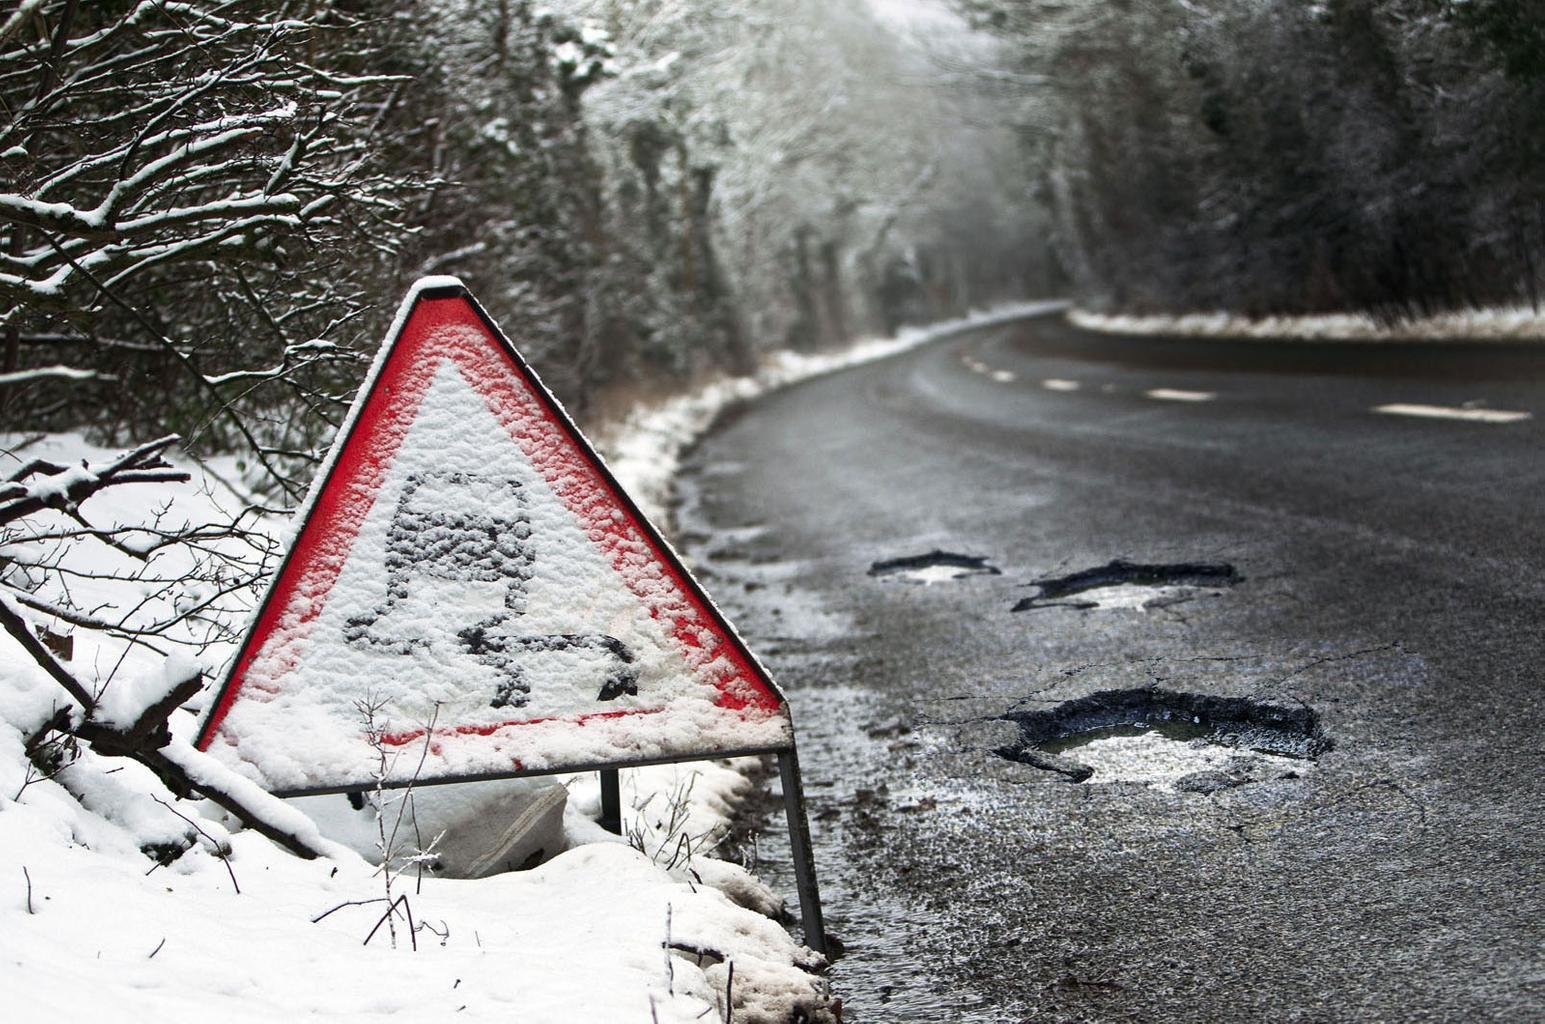 Potholes causing more car breakdowns